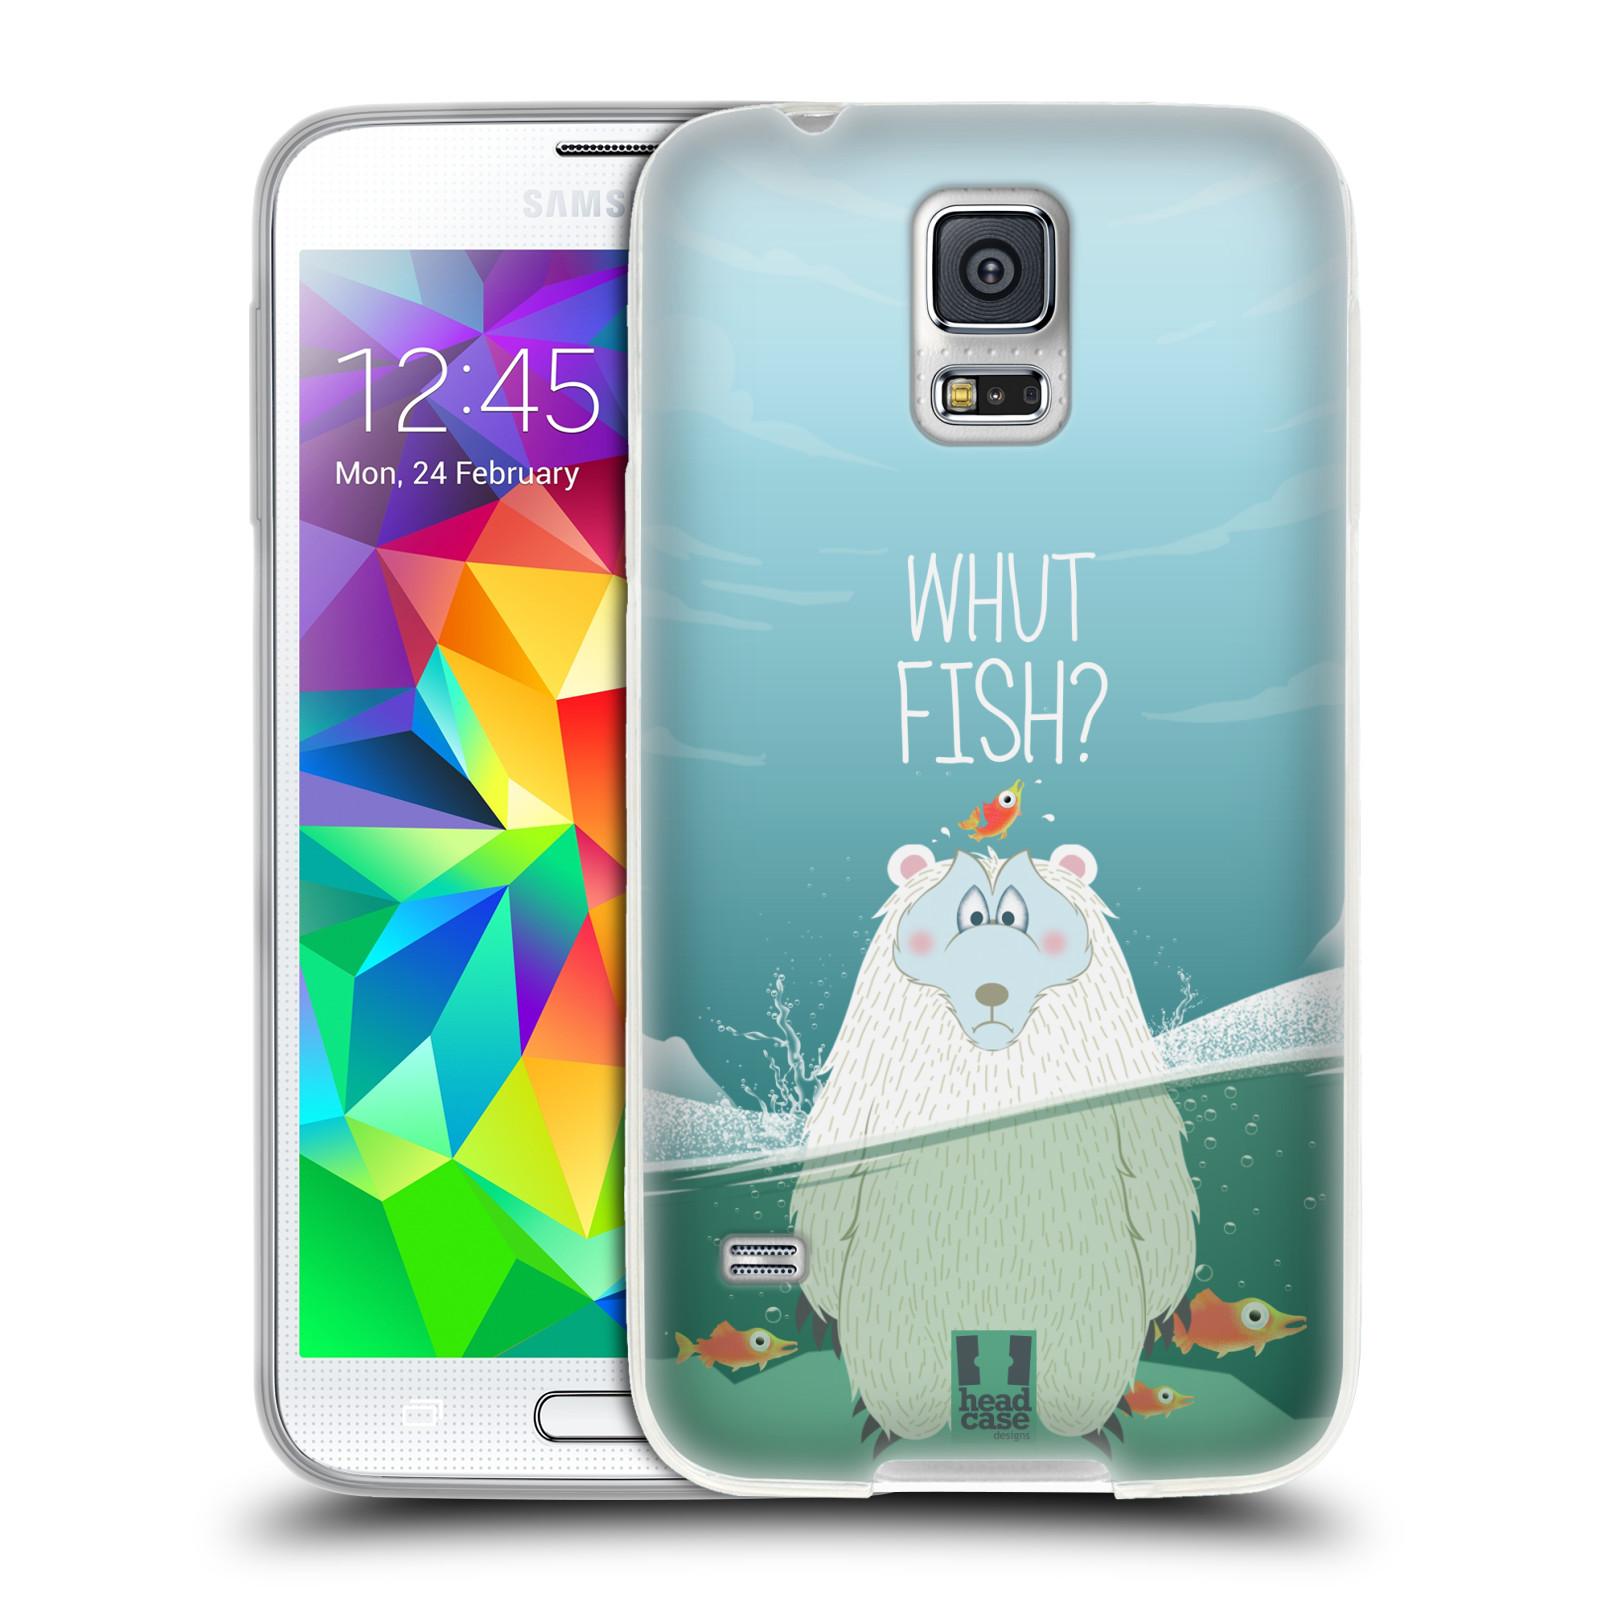 Silikonové pouzdro na mobil Samsung Galaxy S5 Neo HEAD CASE Medvěd Whut Fish?